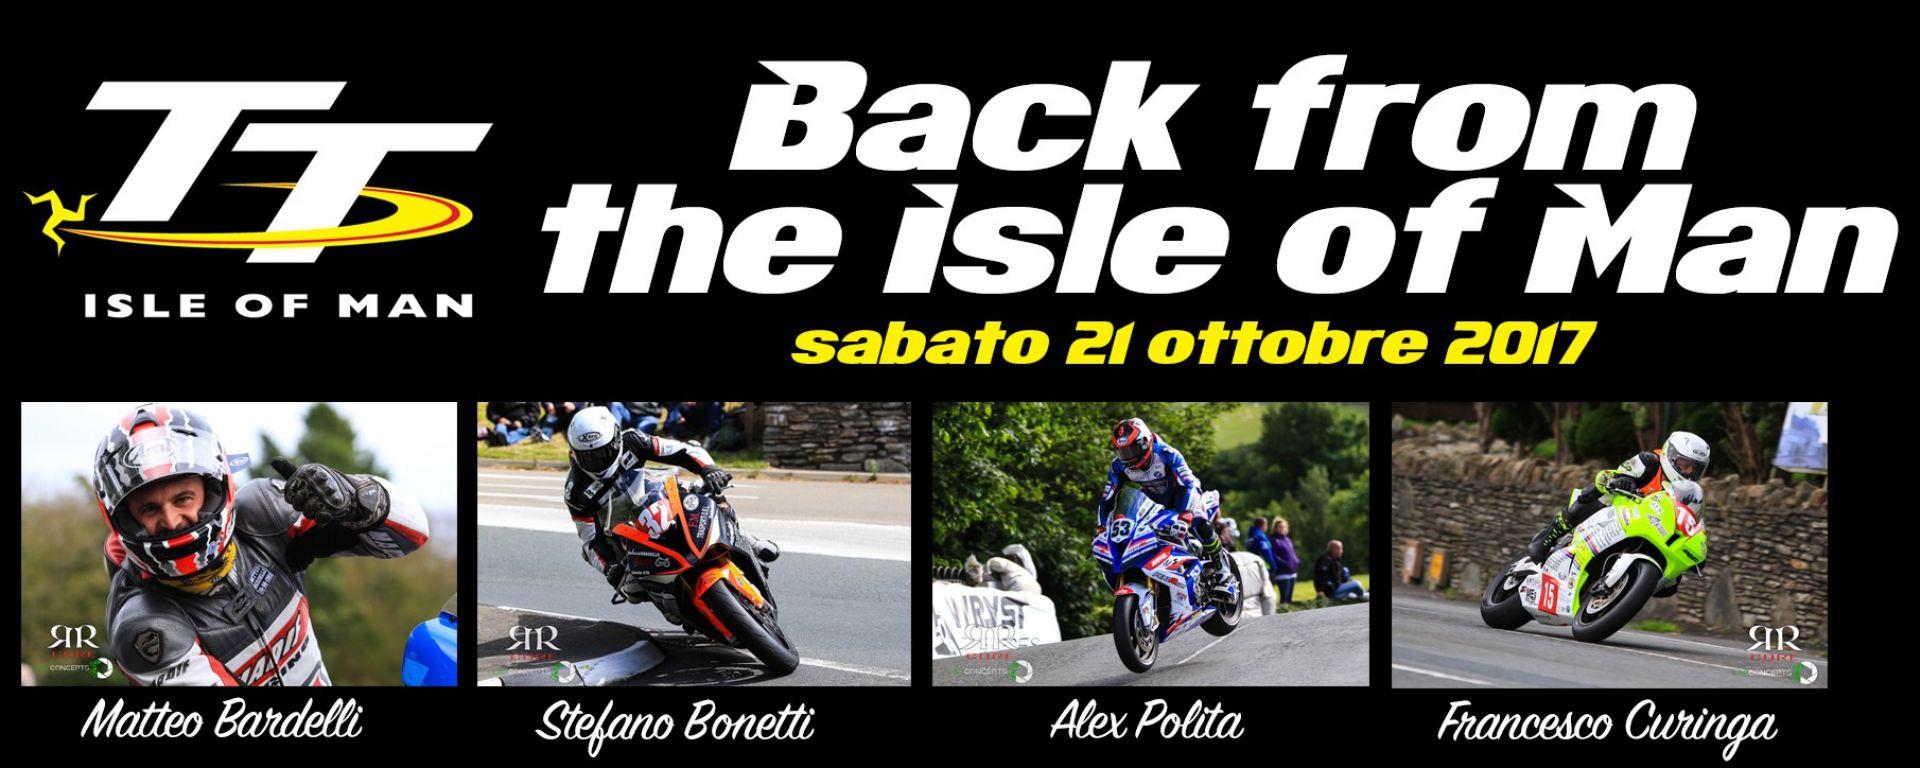 Back from the isle of man: sabato 21 ottobre a ciapa la moto